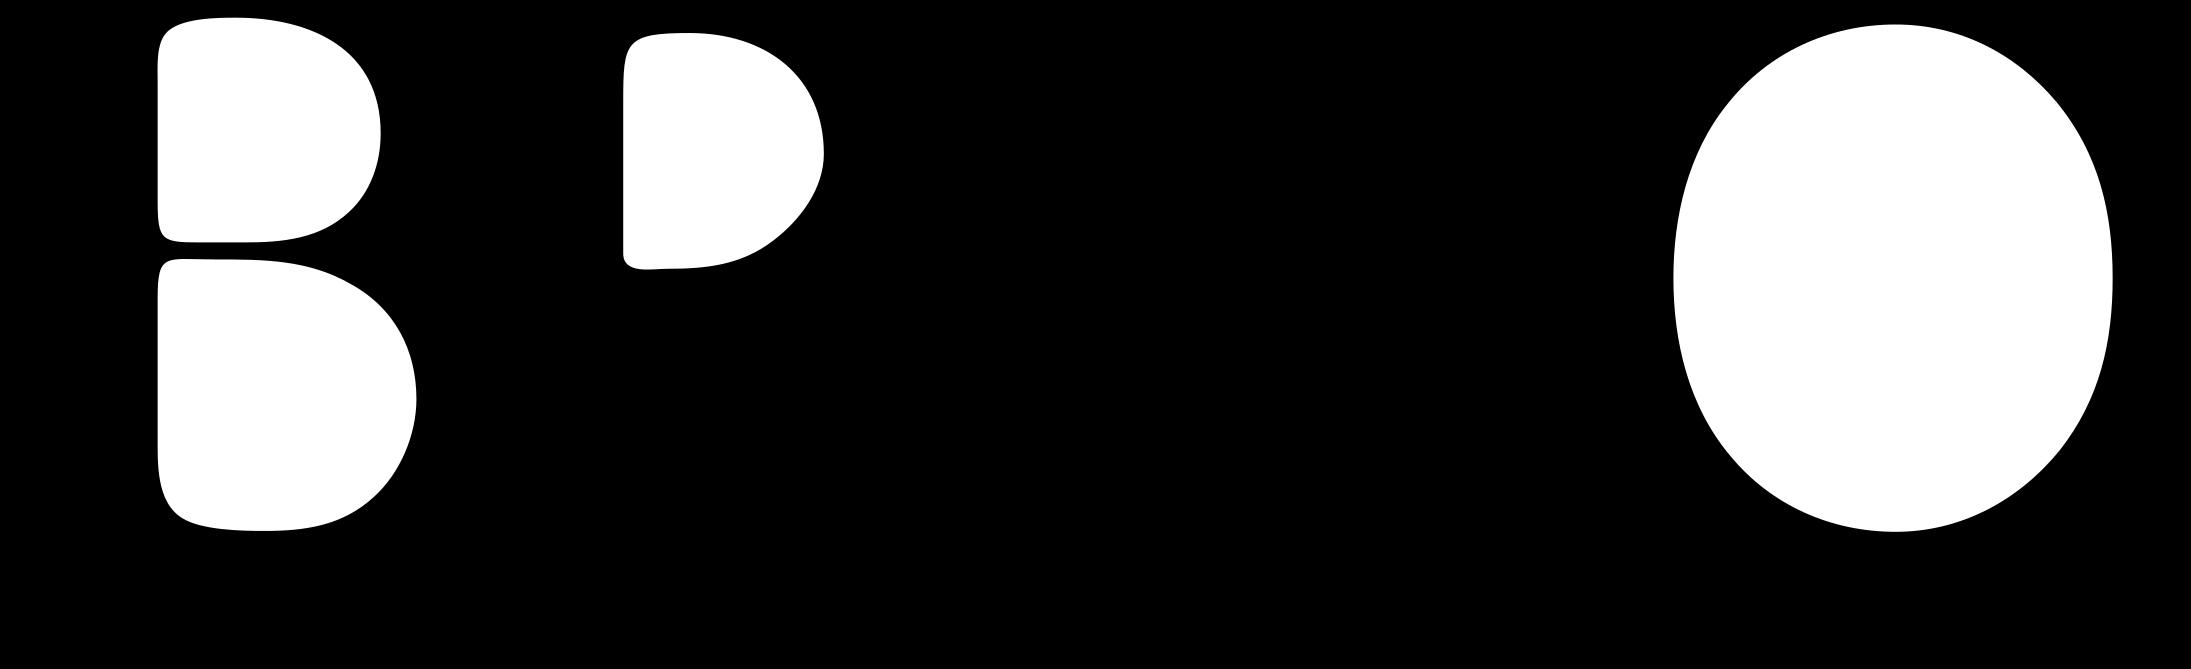 Bravo logo clipart banner black and white download Bravo Logo Transparent - Bravo Logo Clipart - Full Size Clipart ... banner black and white download